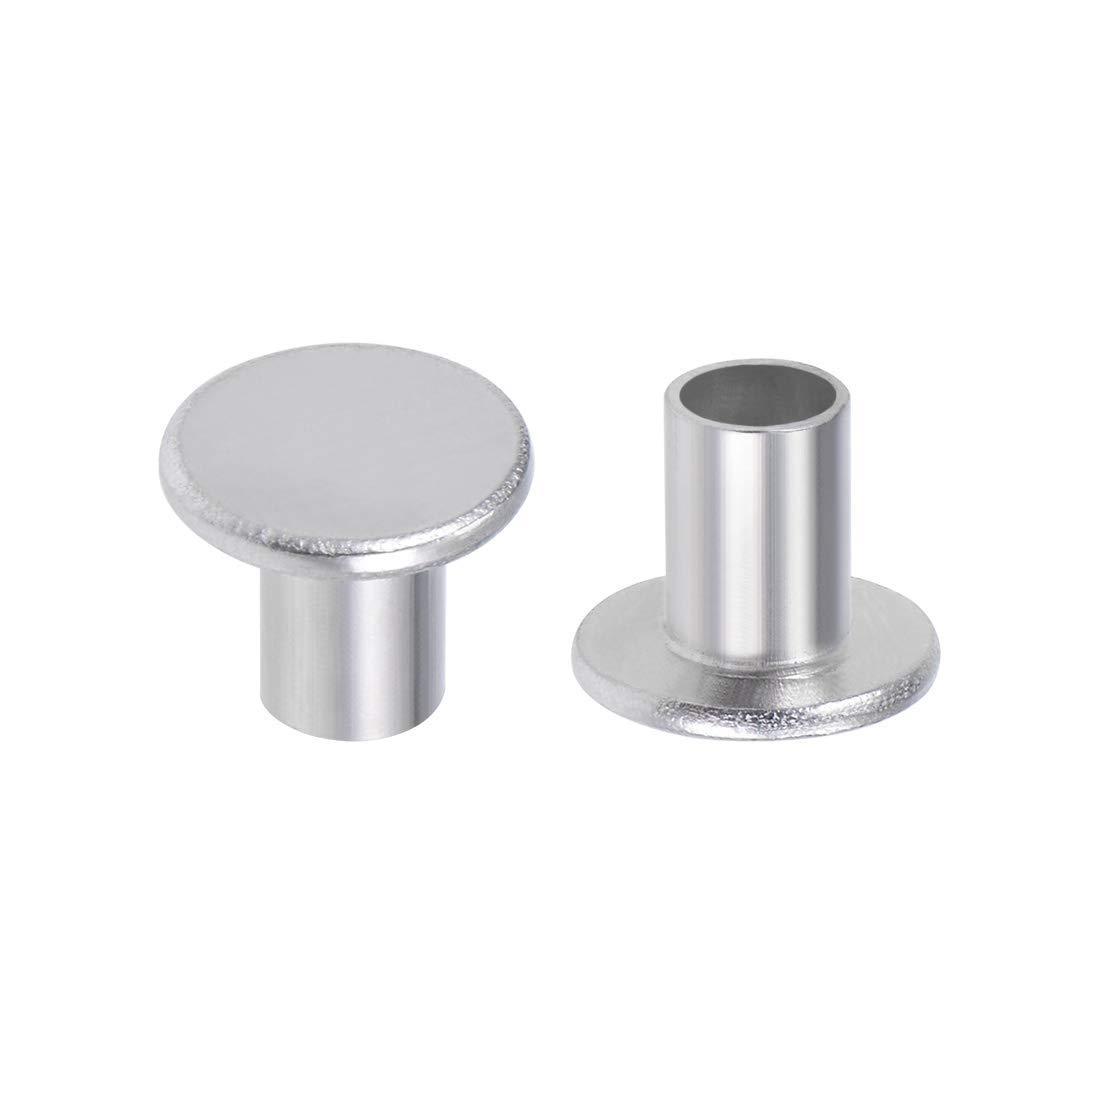 100Pcs 6mm x 8mm Aluminum Flat Head Semi-Tubular Rivets Silver Tone